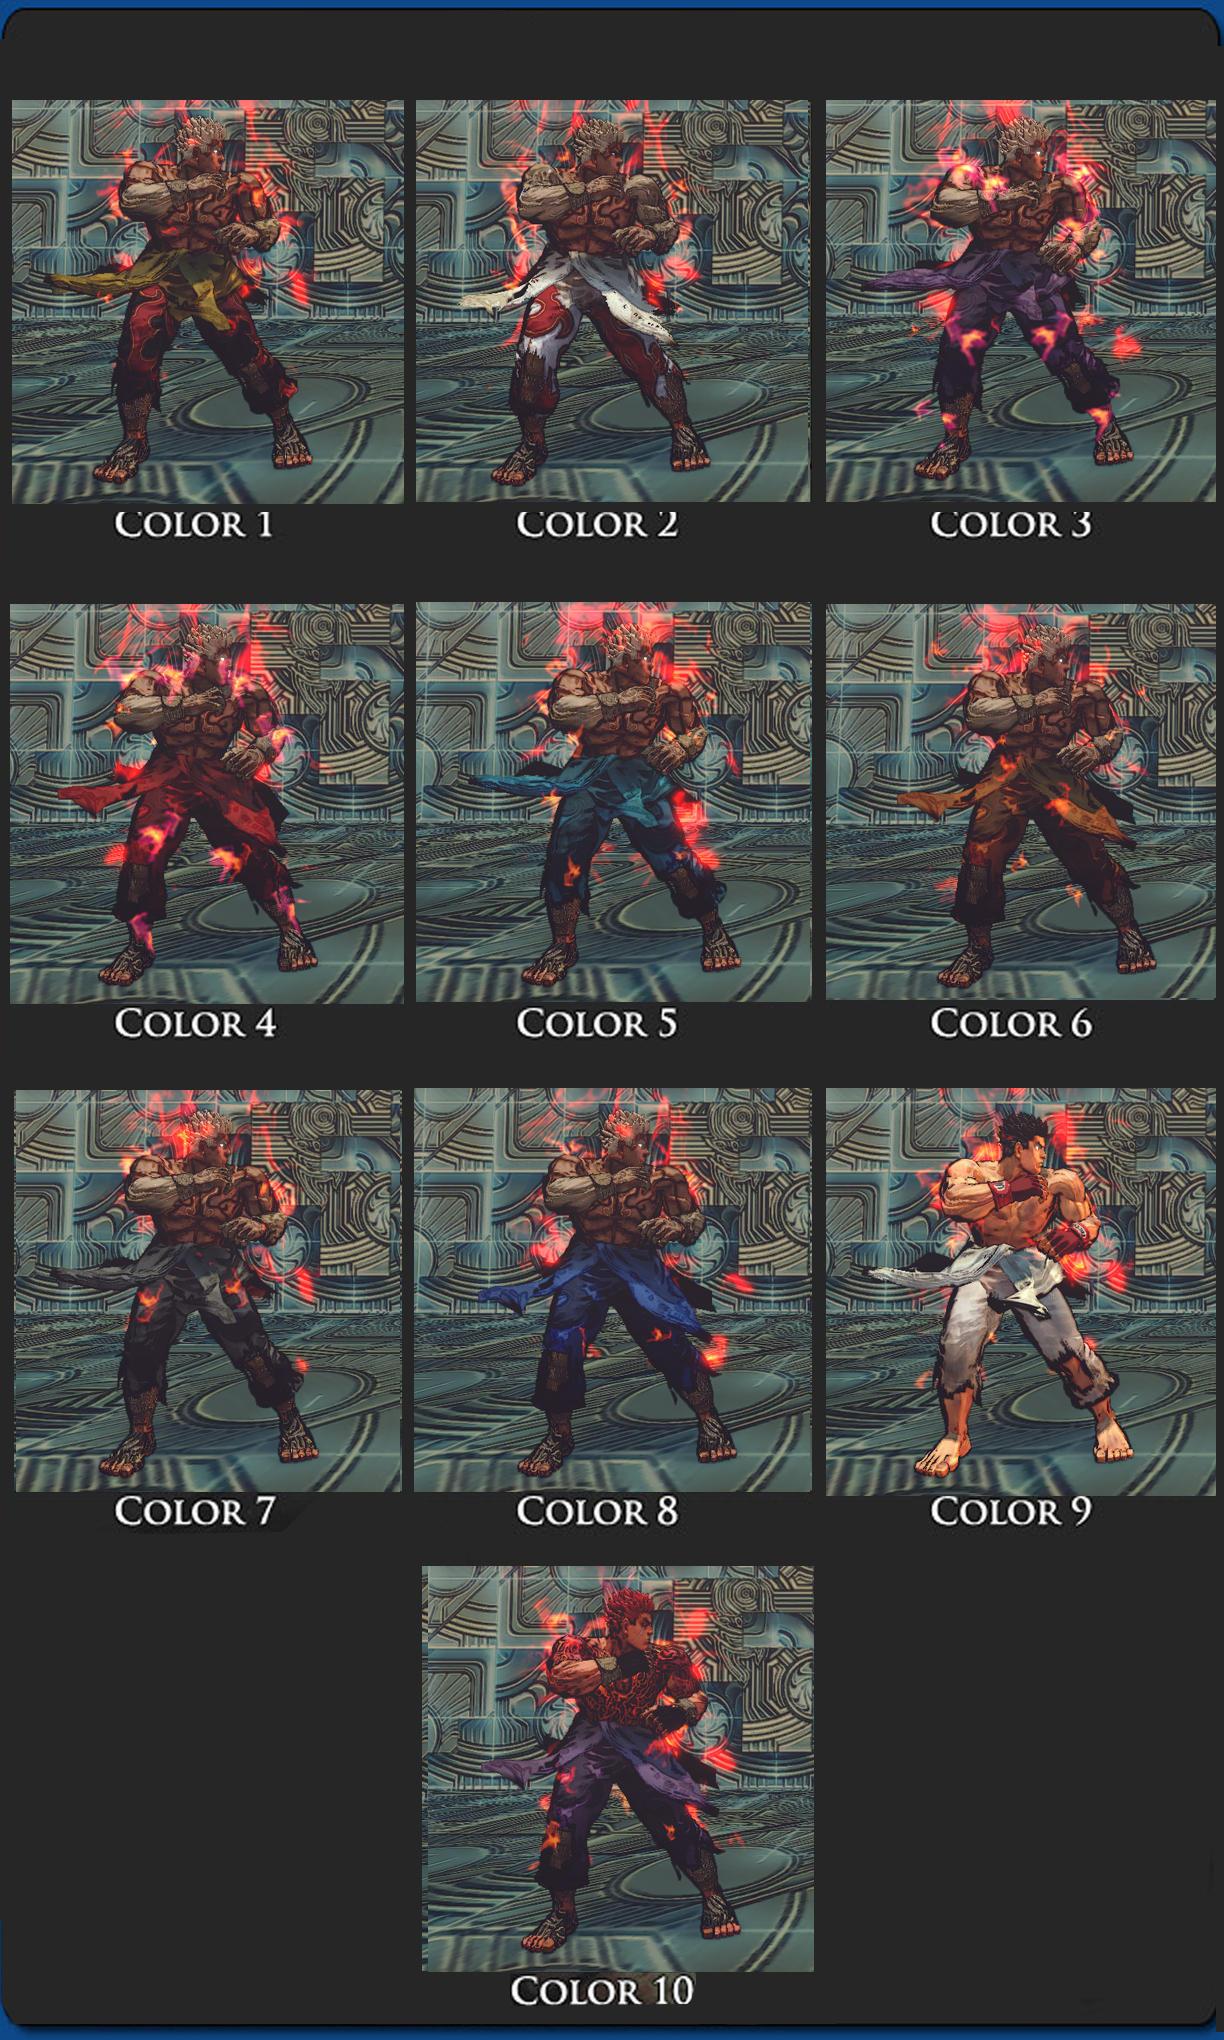 SSFIV Evil Ryu Asura's Wrath Vol 2 10 colors pack by monkeygigabuster